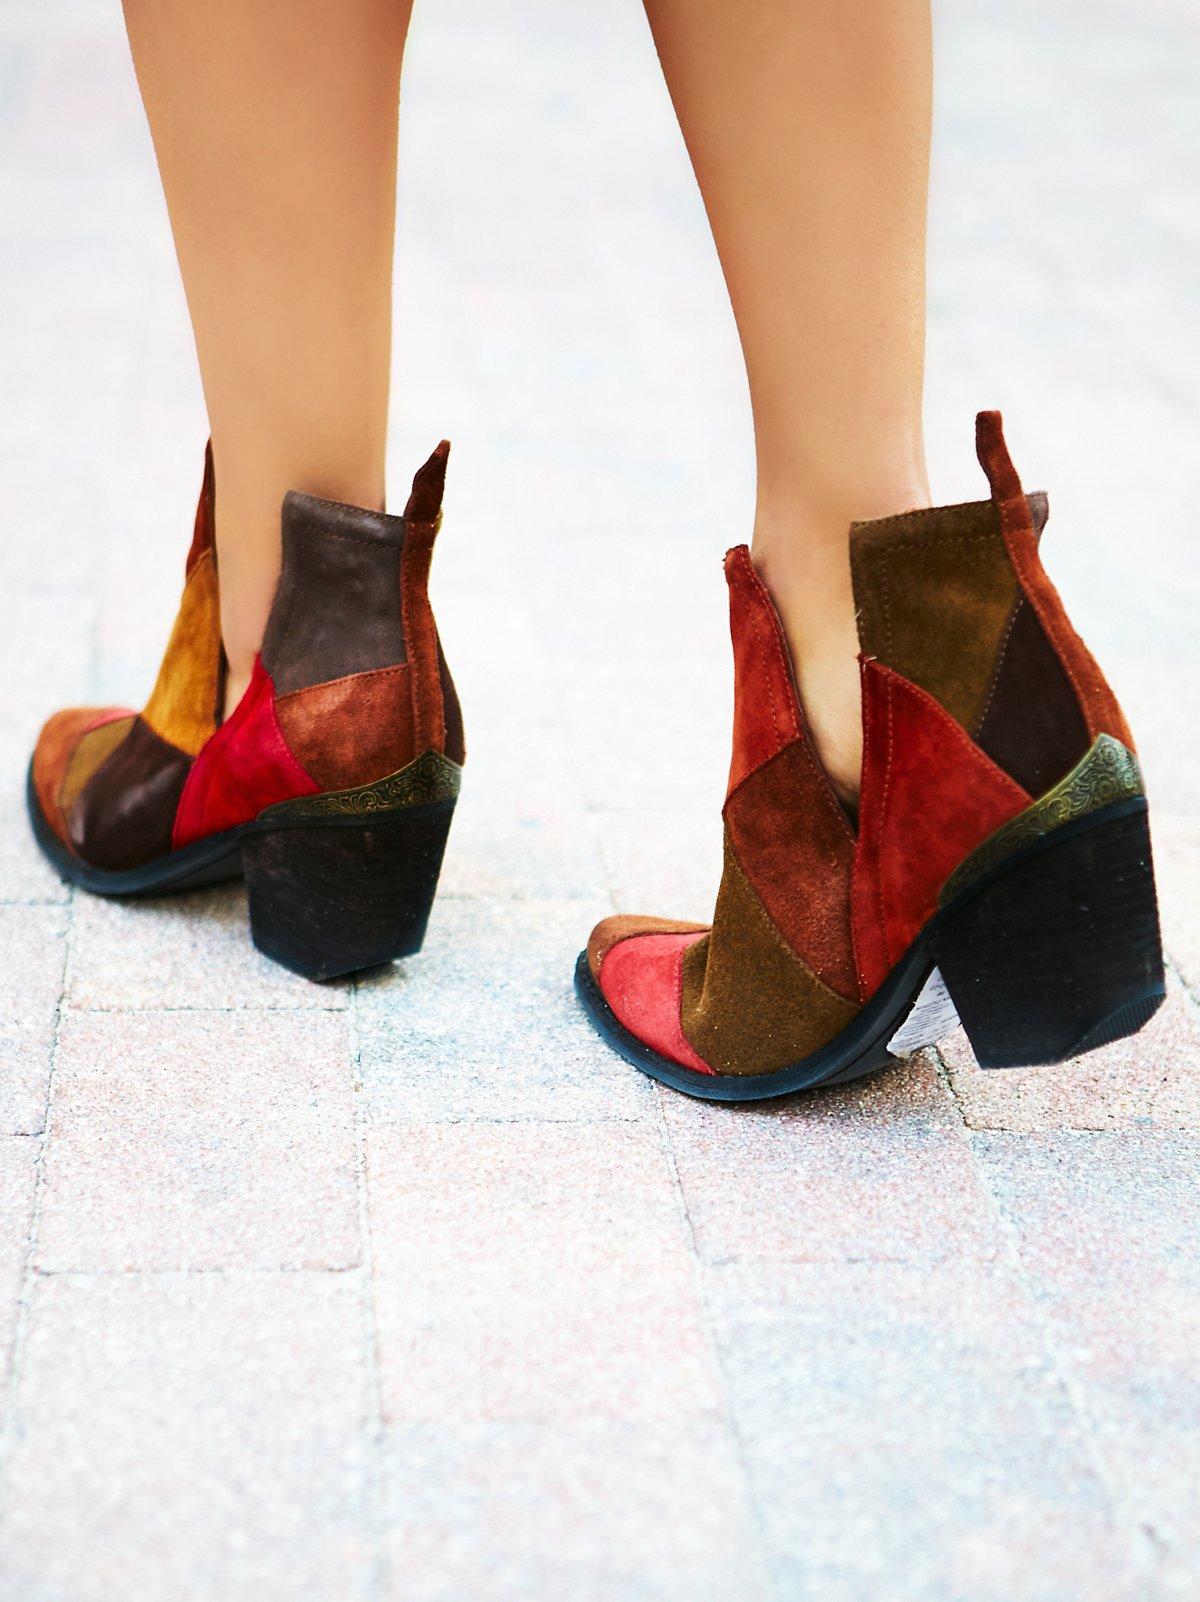 Hunt the Plains拼贴靴子